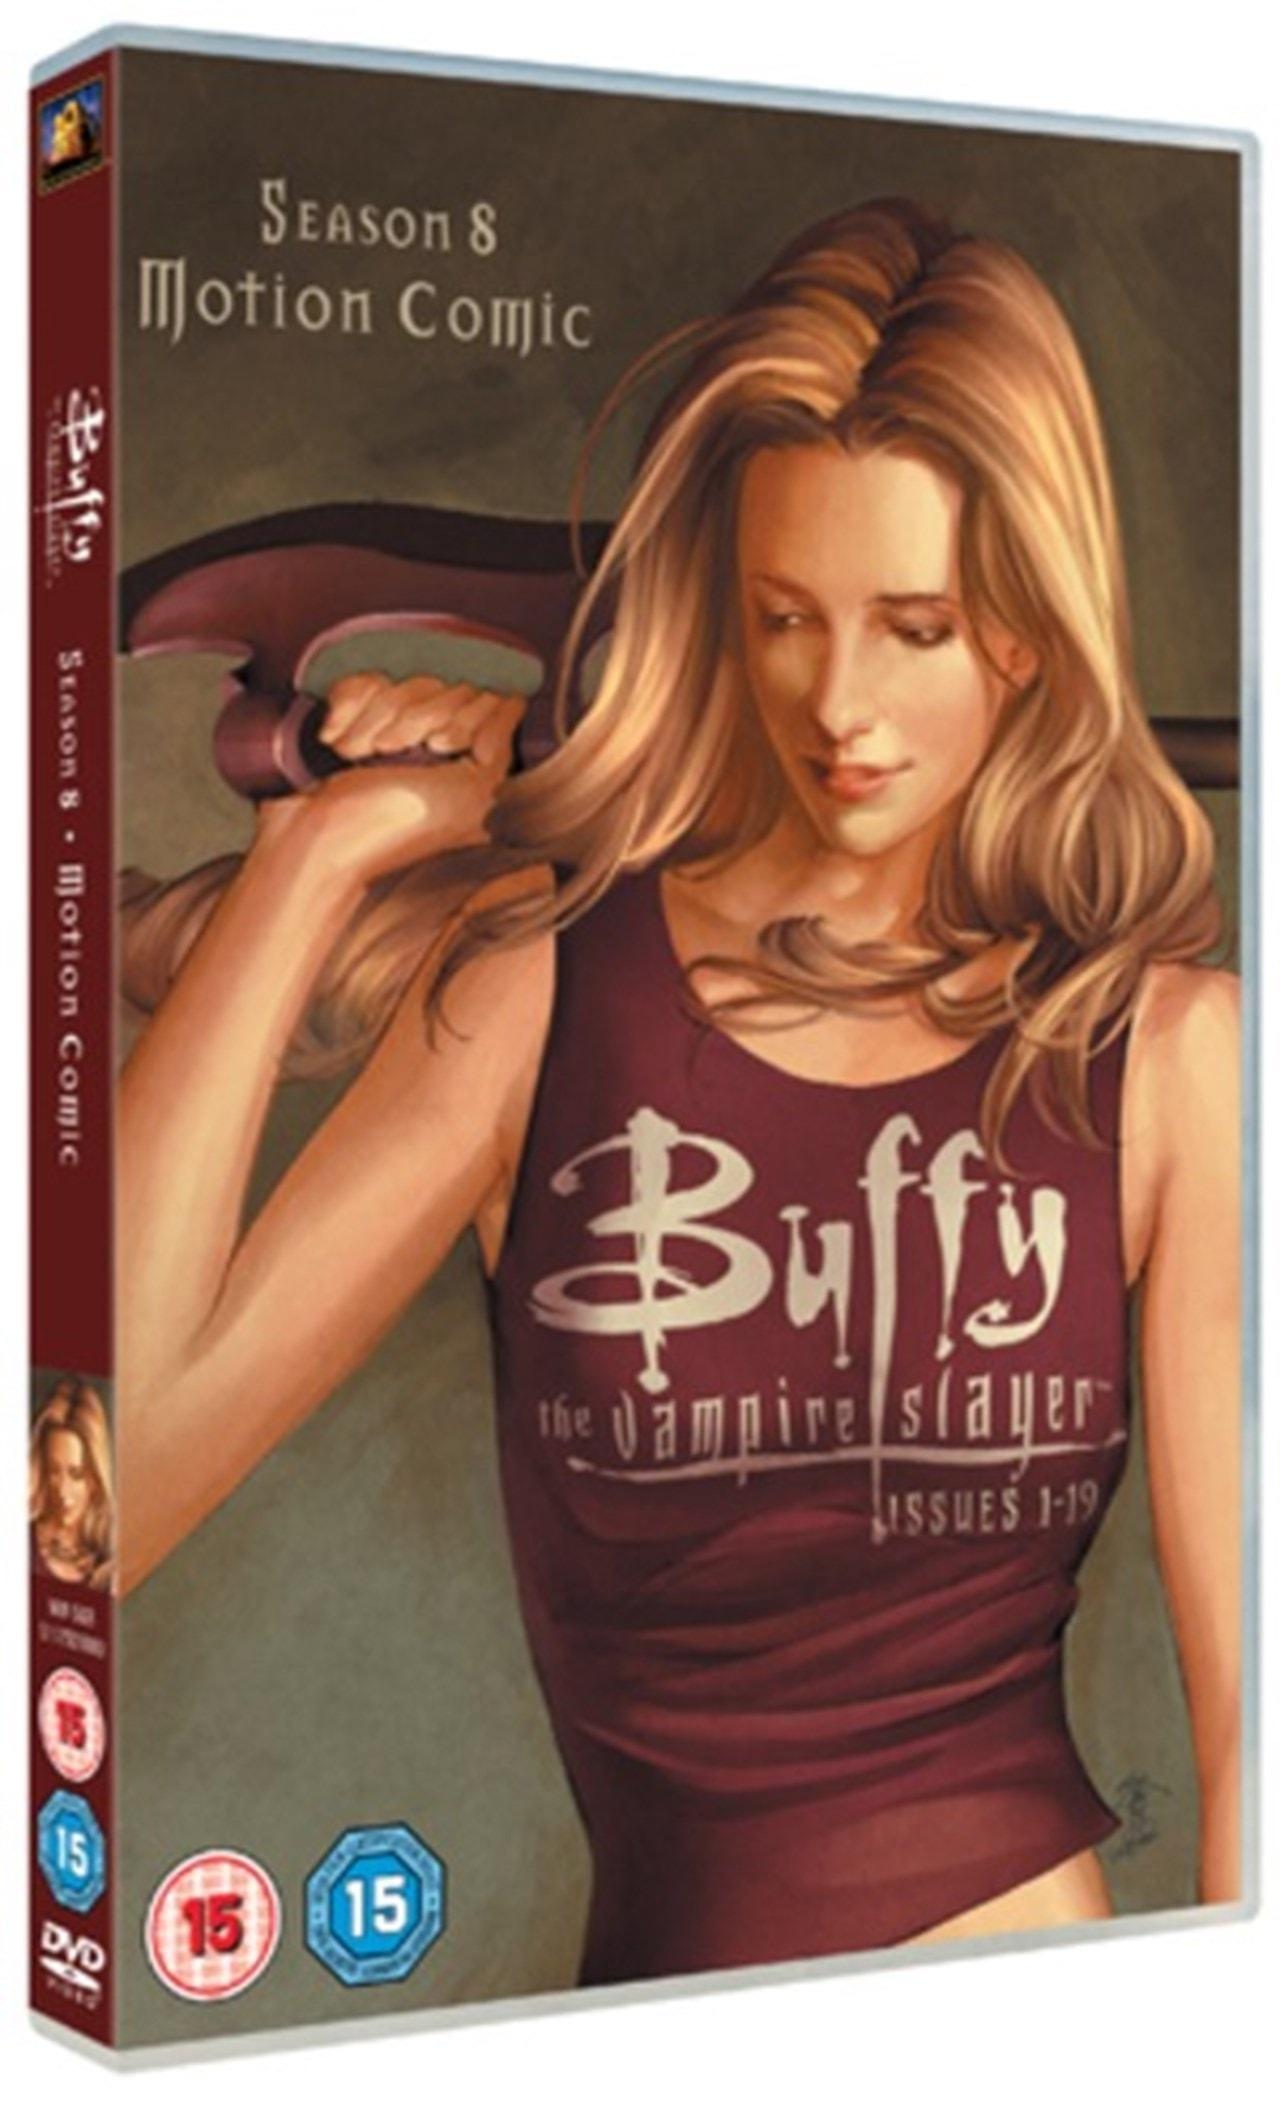 Buffy the Vampire Slayer: Season 8 - Motion Comic - 1